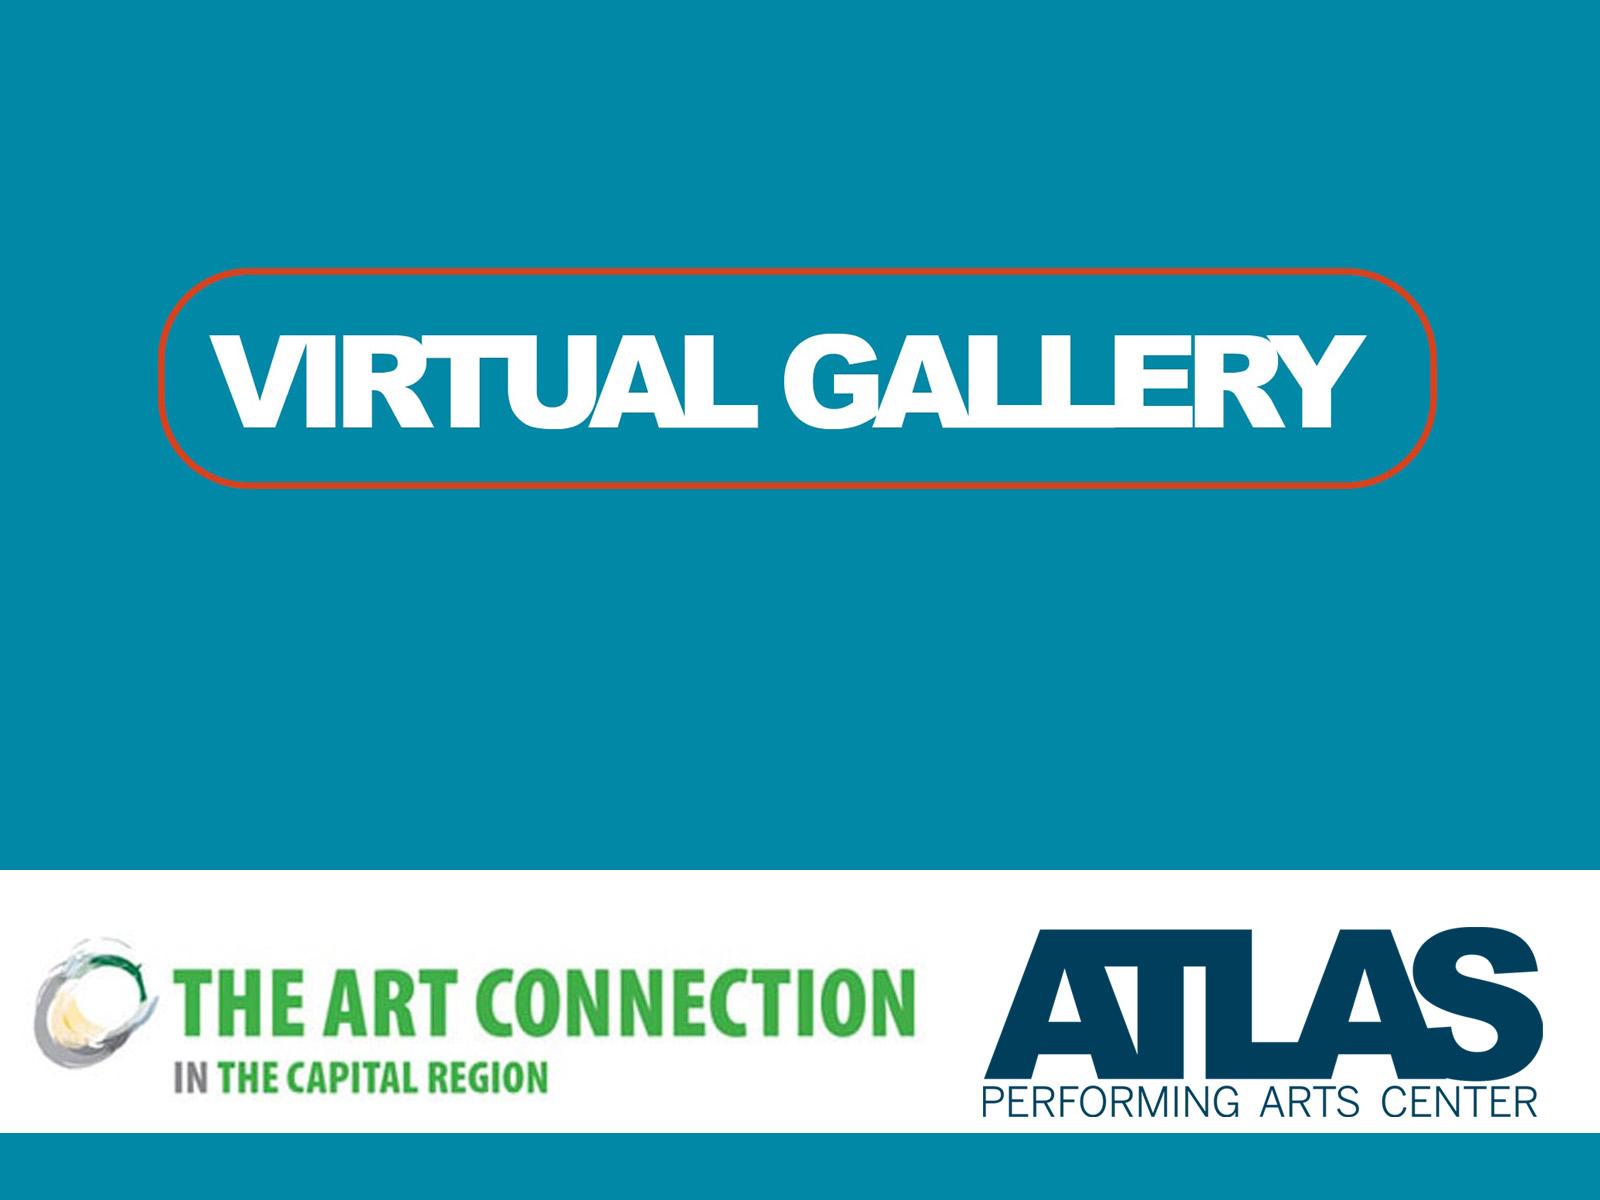 virtual gallery Art Connection  and Atlas logo